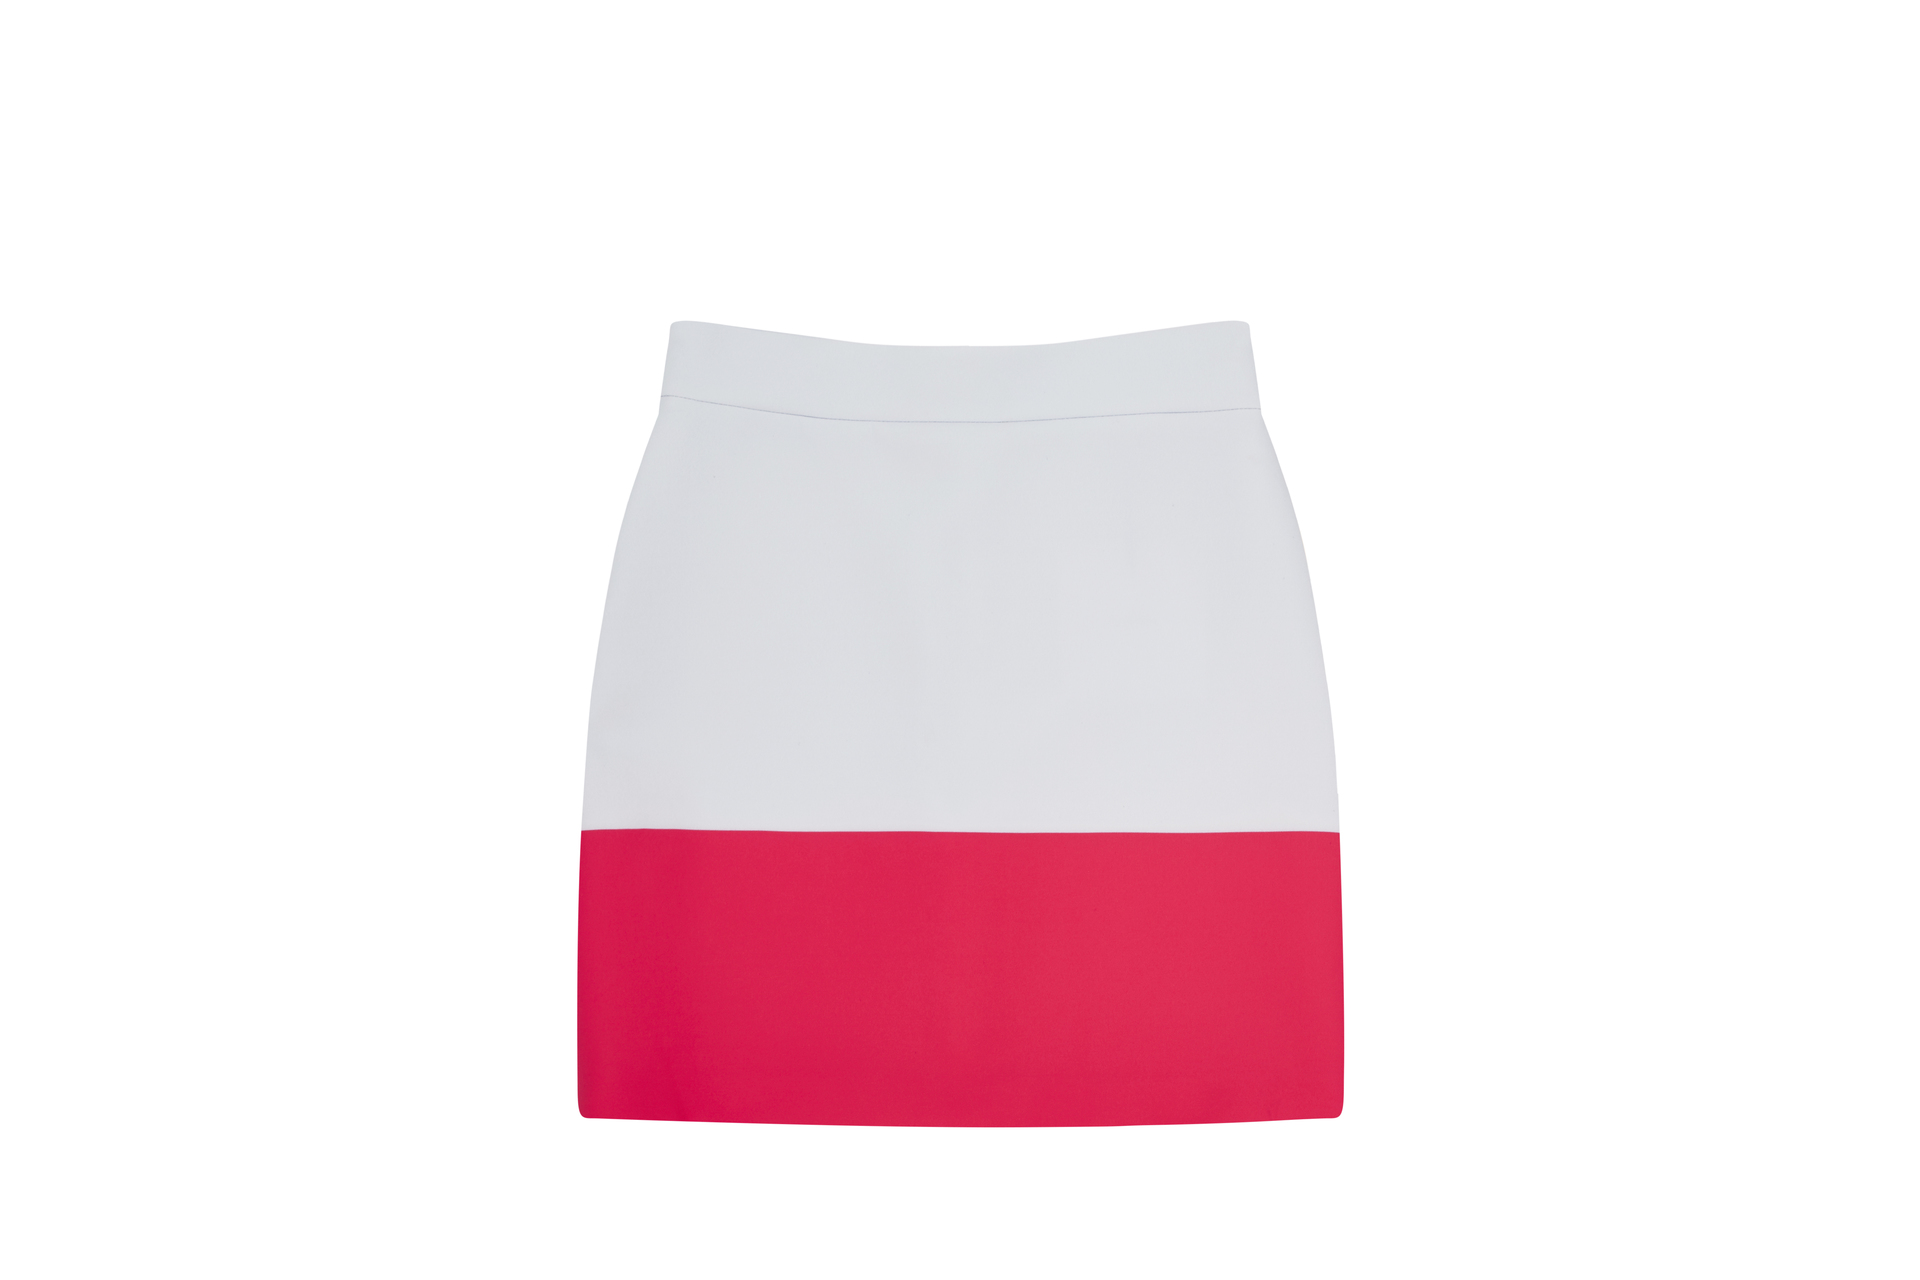 72dpi-239139cb57-64.-BY-JOHNNY,-Bold-Colour-Mini-Skirt-Sky-Blue-Pink,-250,-www.byjohnny.com.au